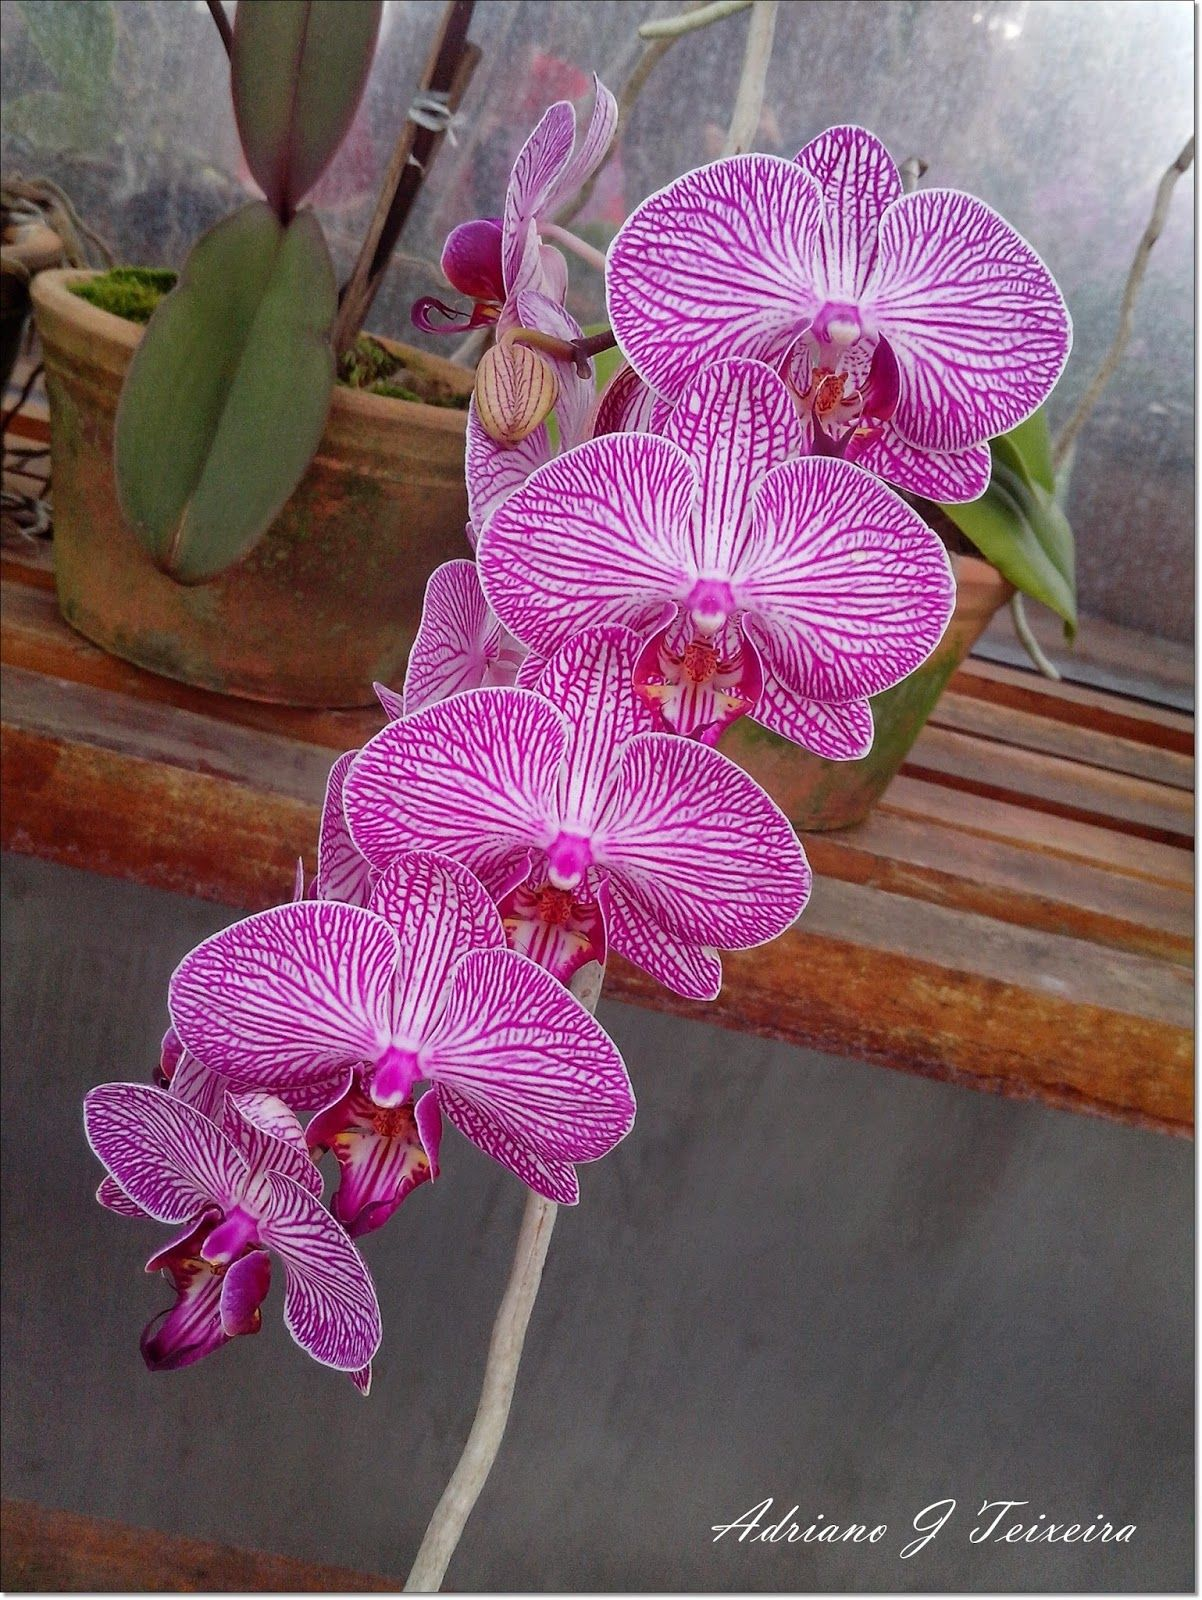 Mundo das Plantas : Orquídeas